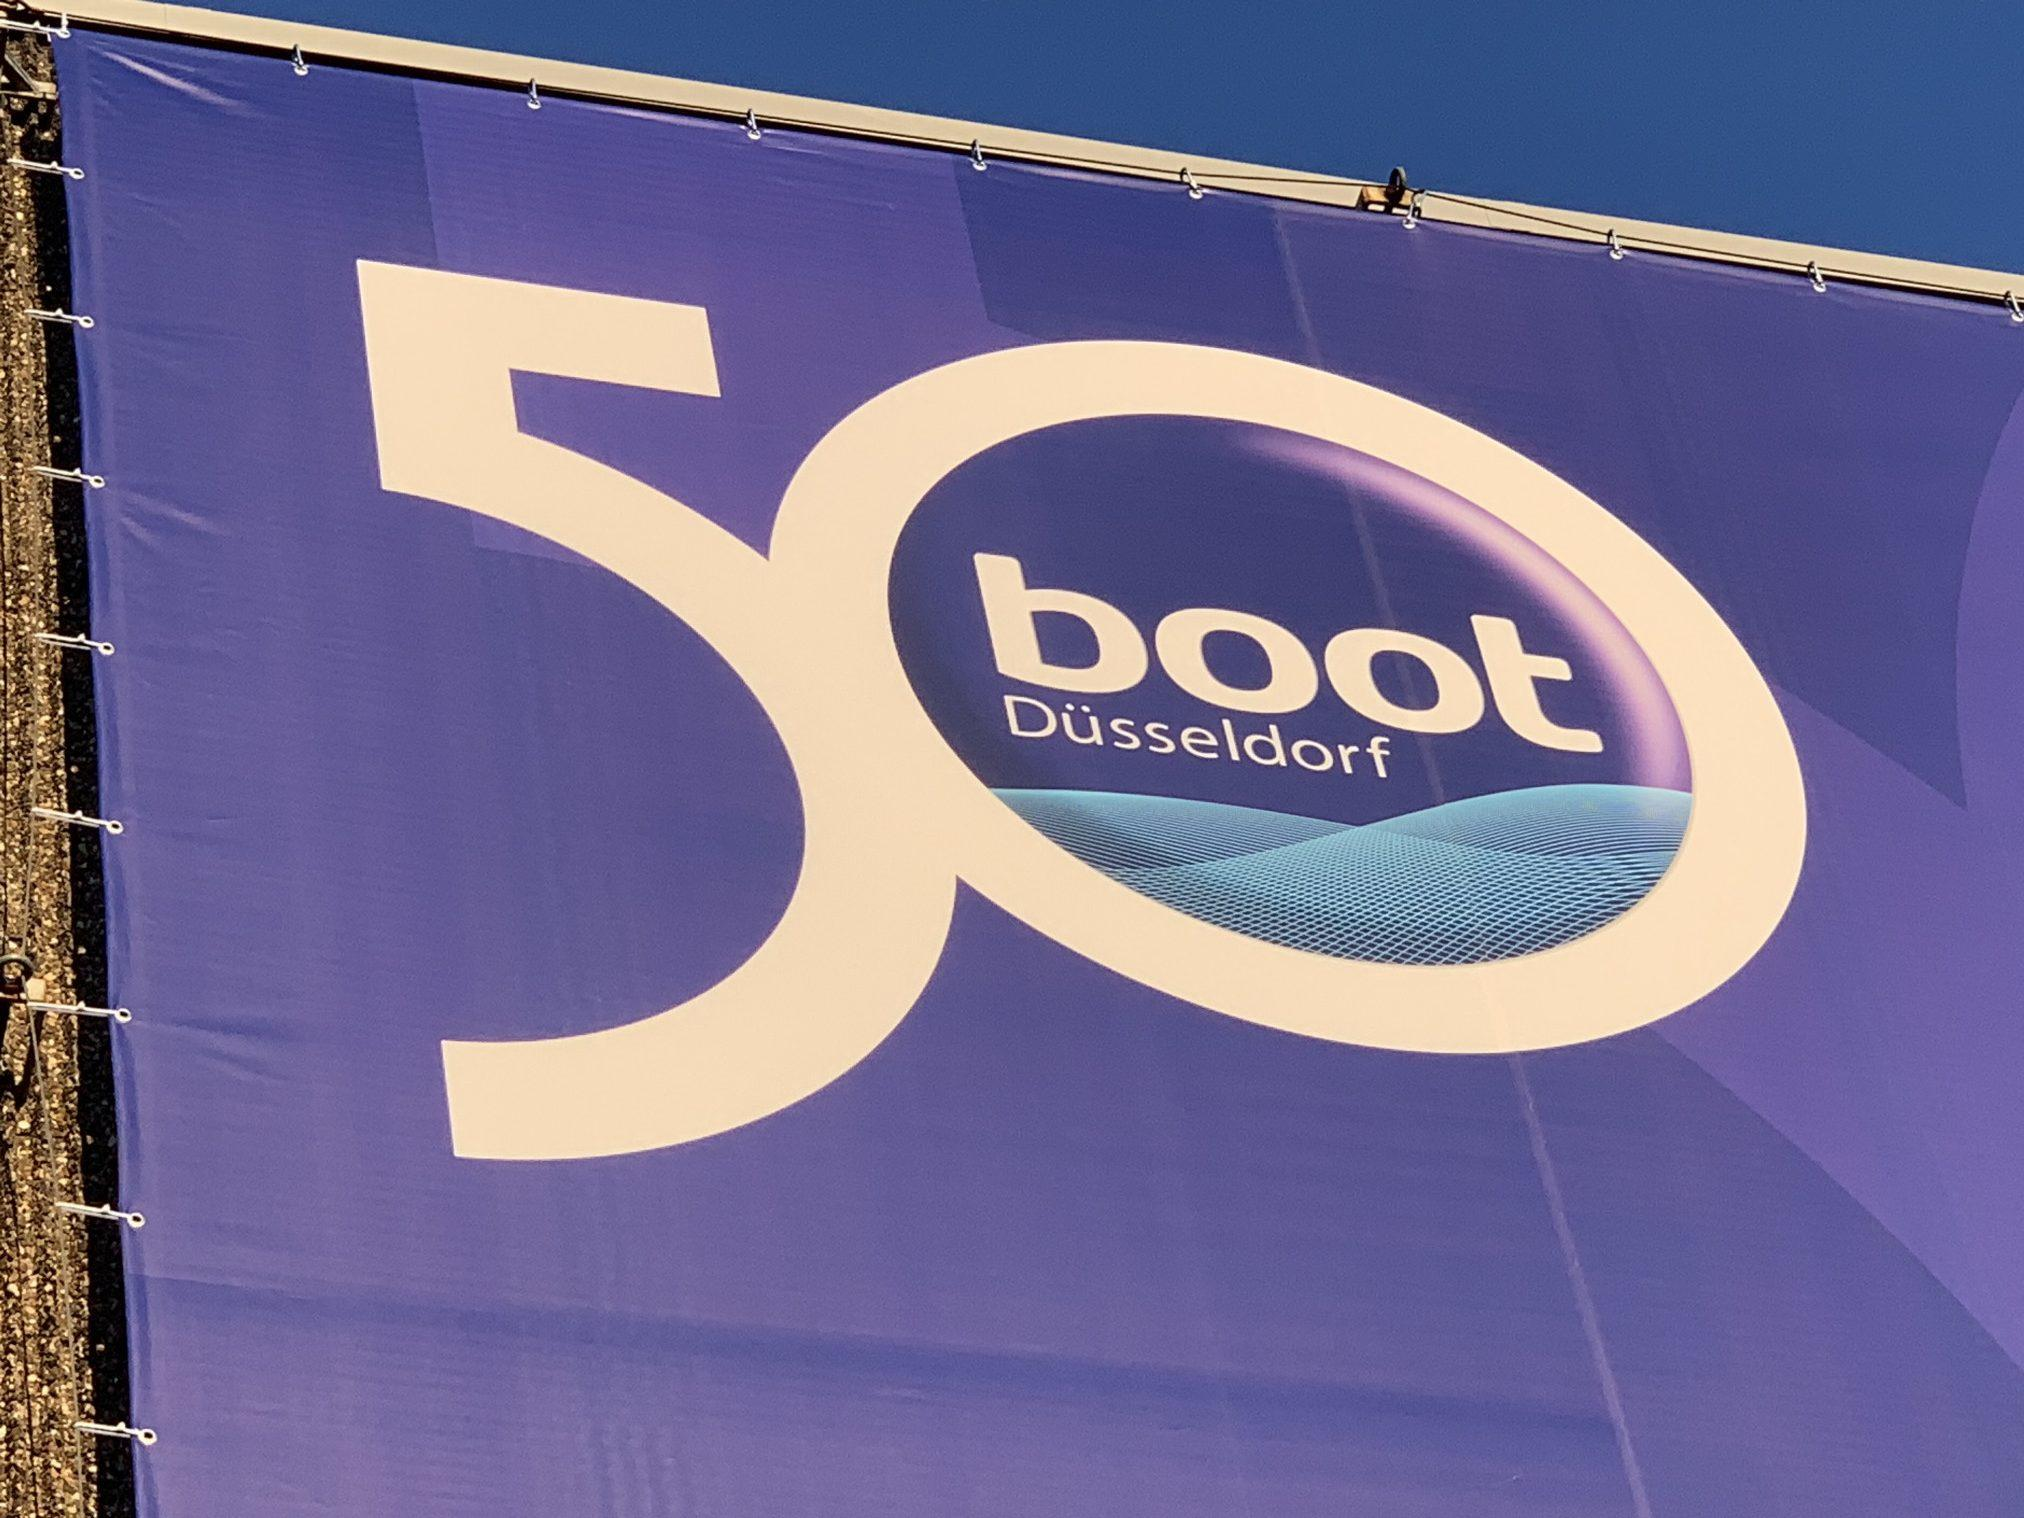 Dusseldorf BOOT